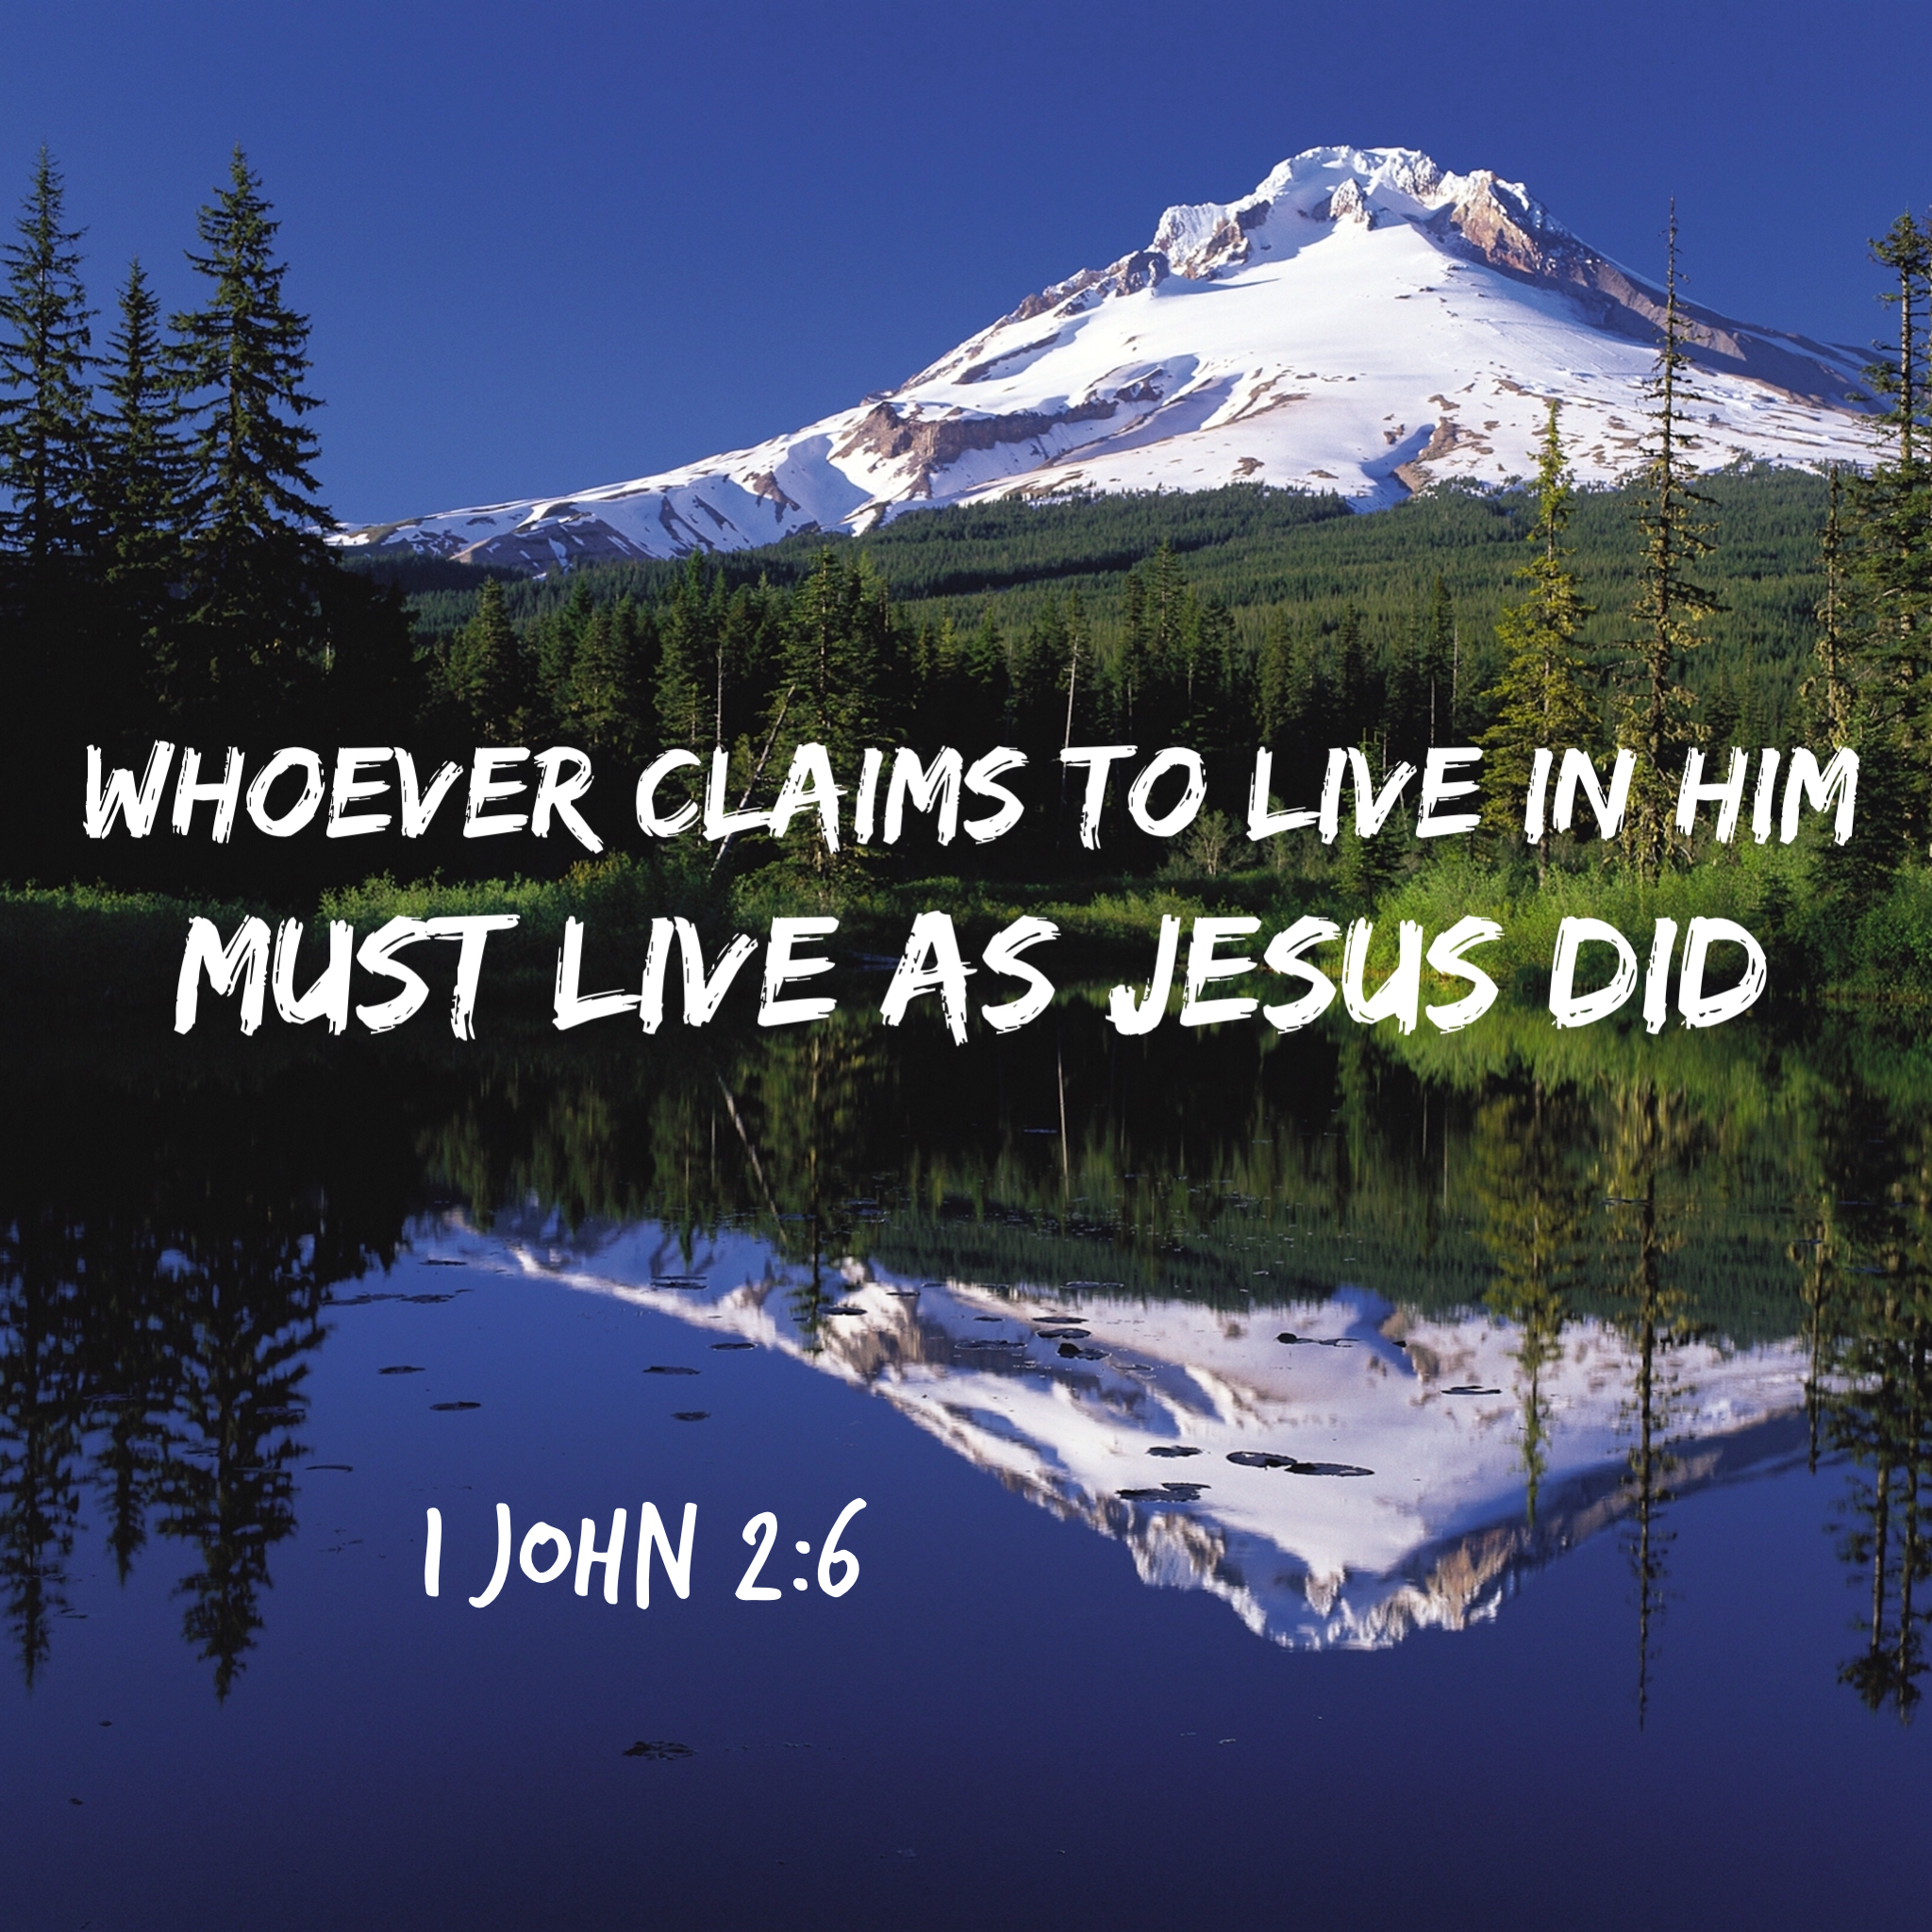 1 John 2:6 scripture picture